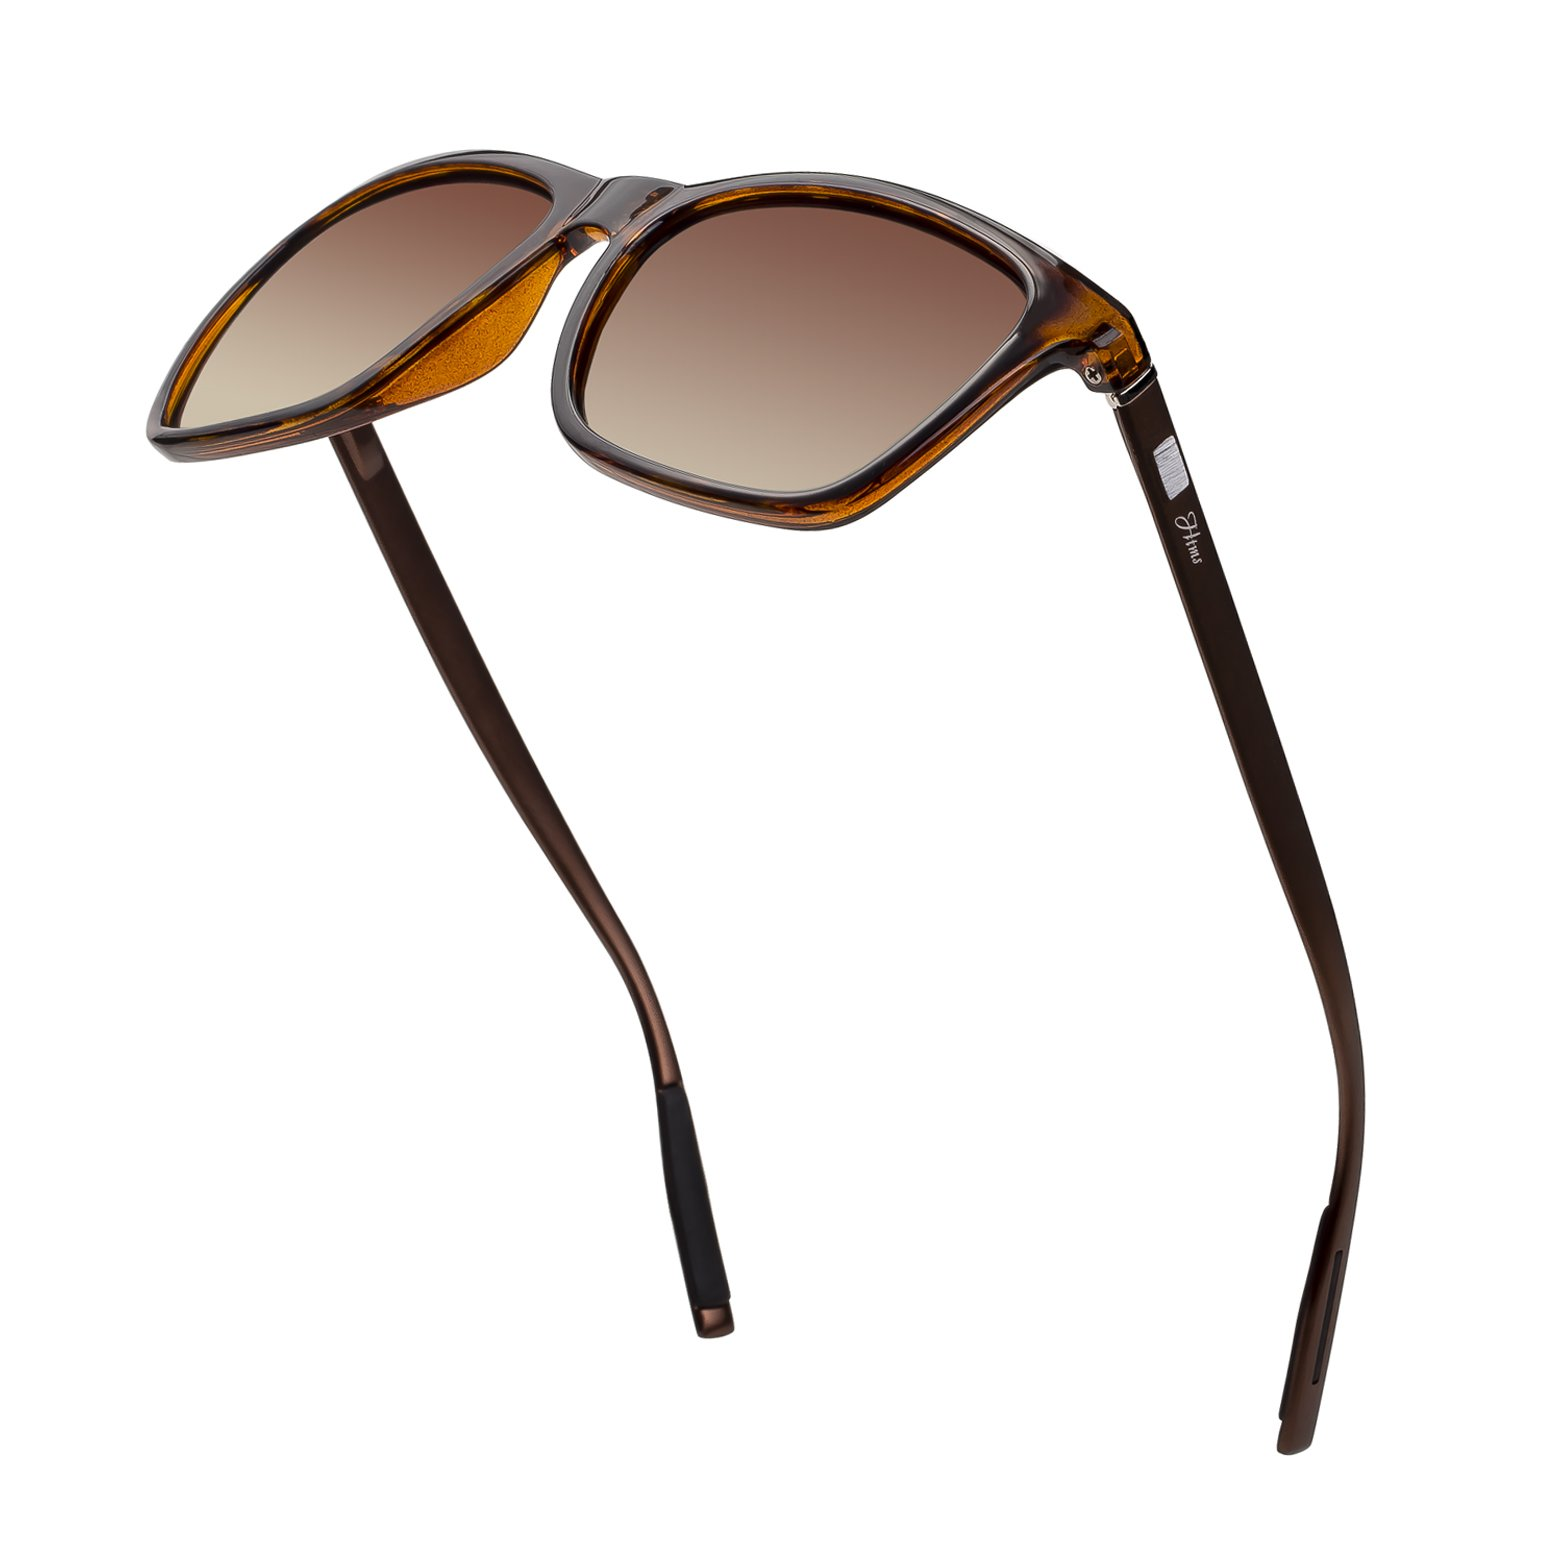 Square Aluminum Magnesium Frame Polarized Sunglasses Vintage Spring Temple Sun Glasses Men Women Retro Driving Eyewear UV400 (Brown Lens/Leopard Frame)